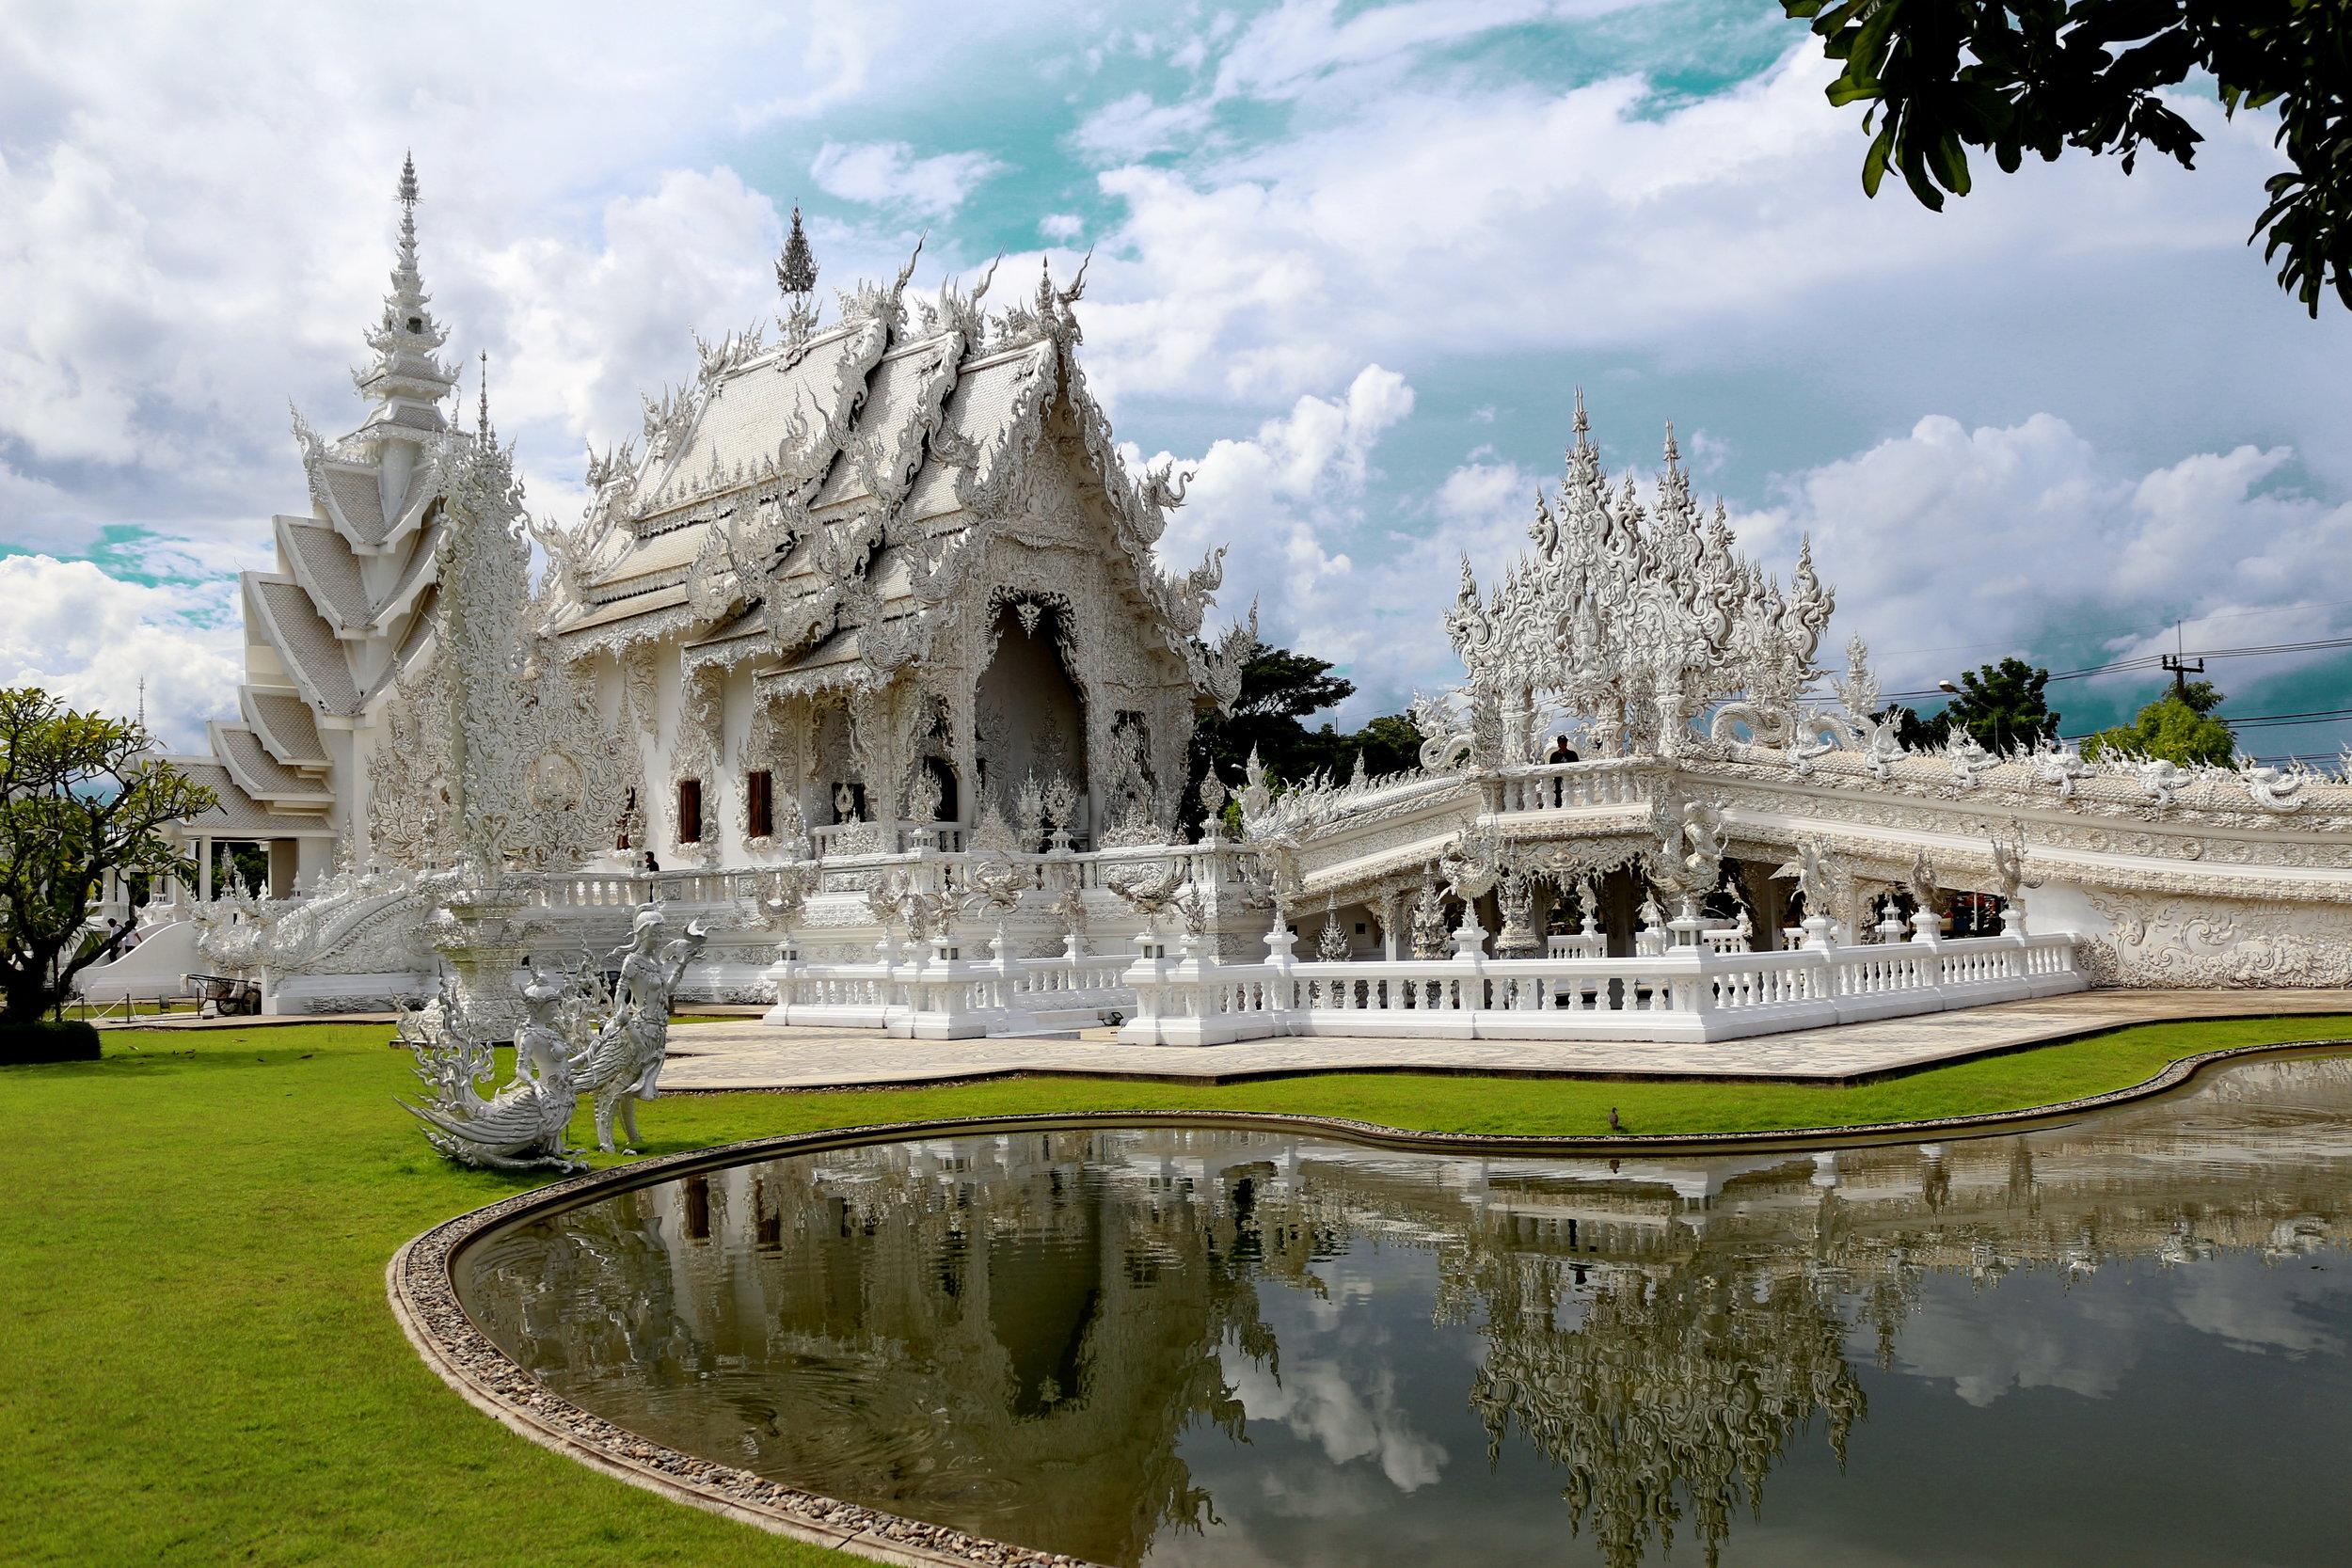 Chiang Rai - Wat Rong Khun Temple